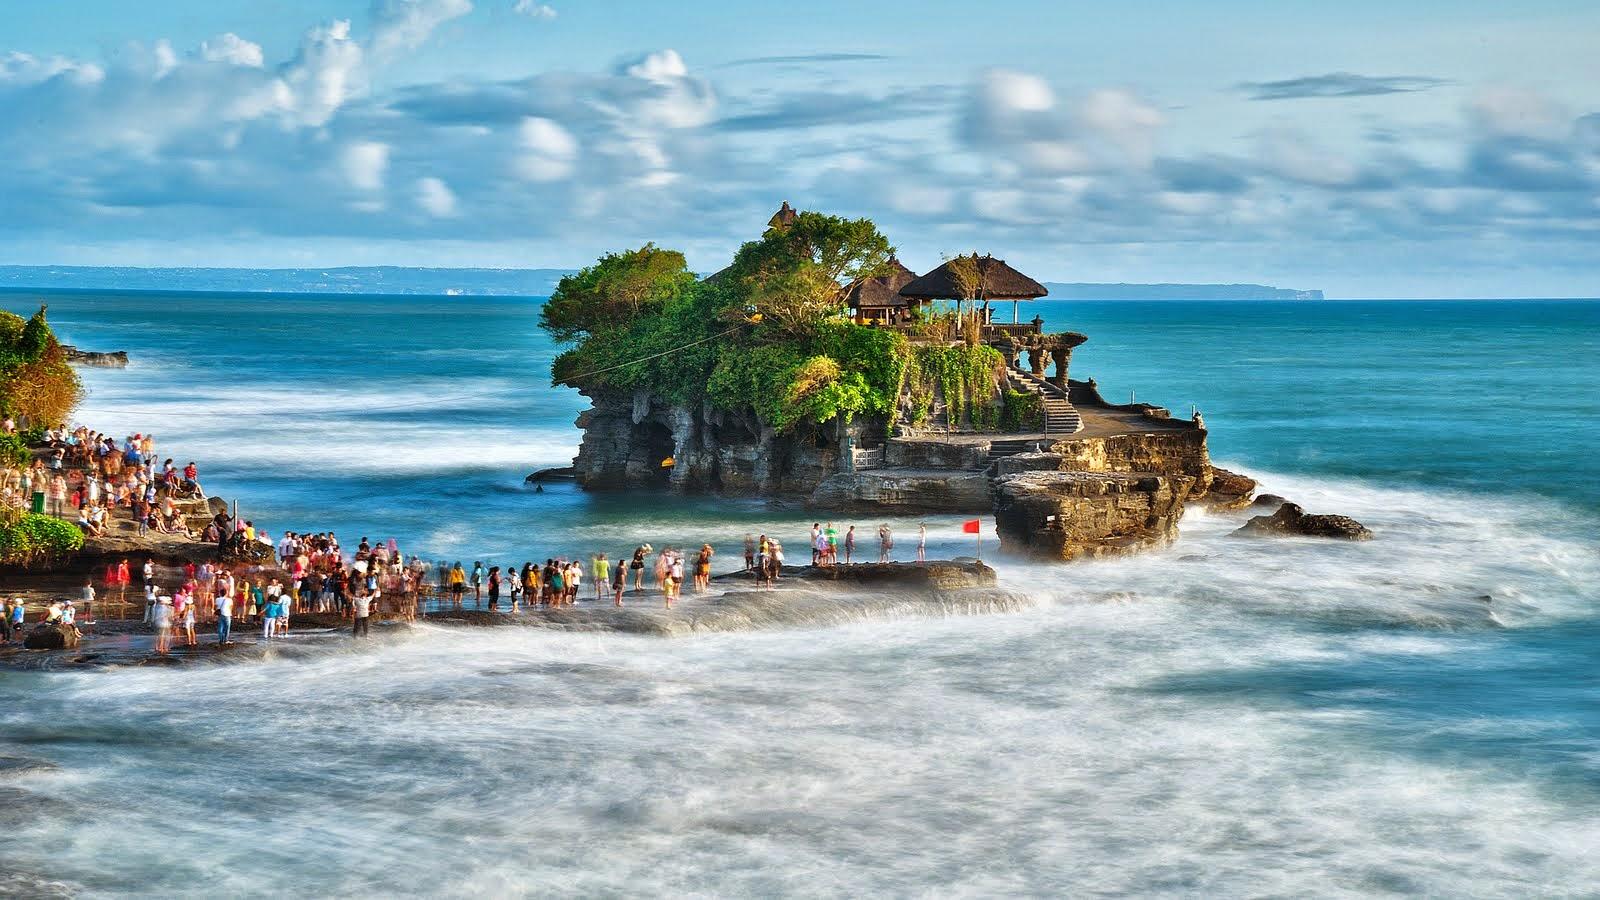 30 tempat wisata bali yang awesome banget part 2